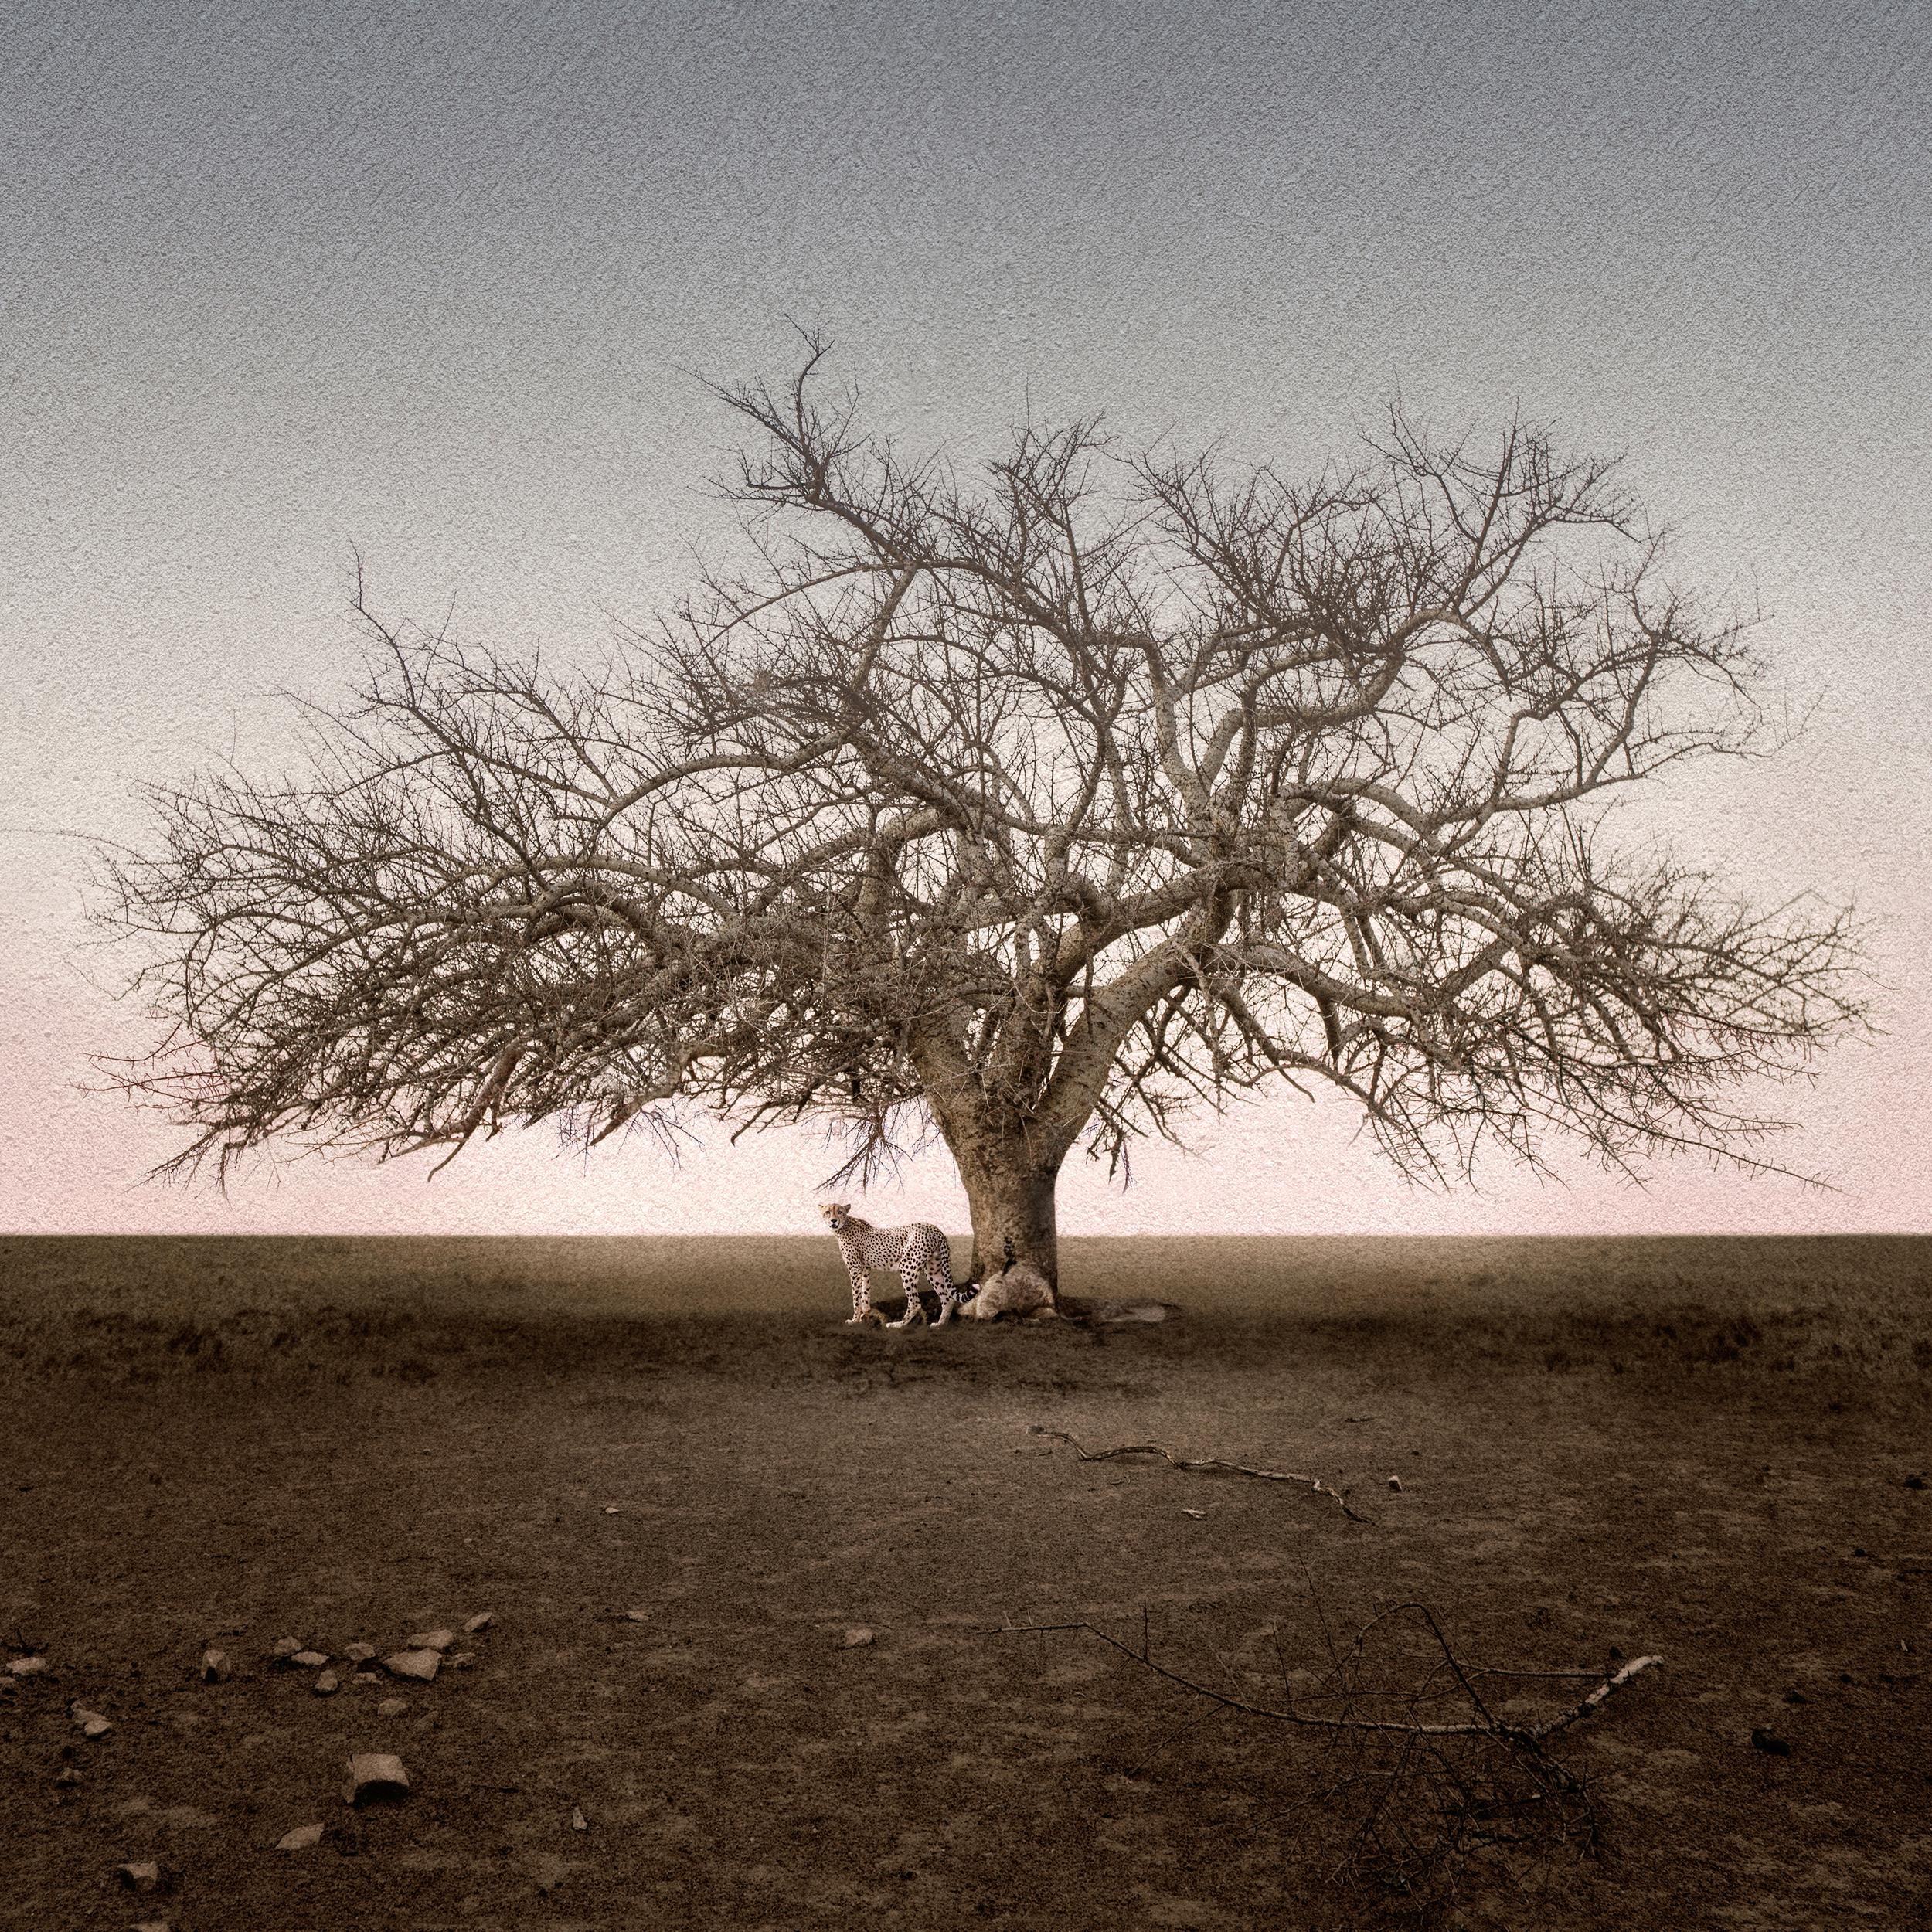 Cheetah and Lone Tree